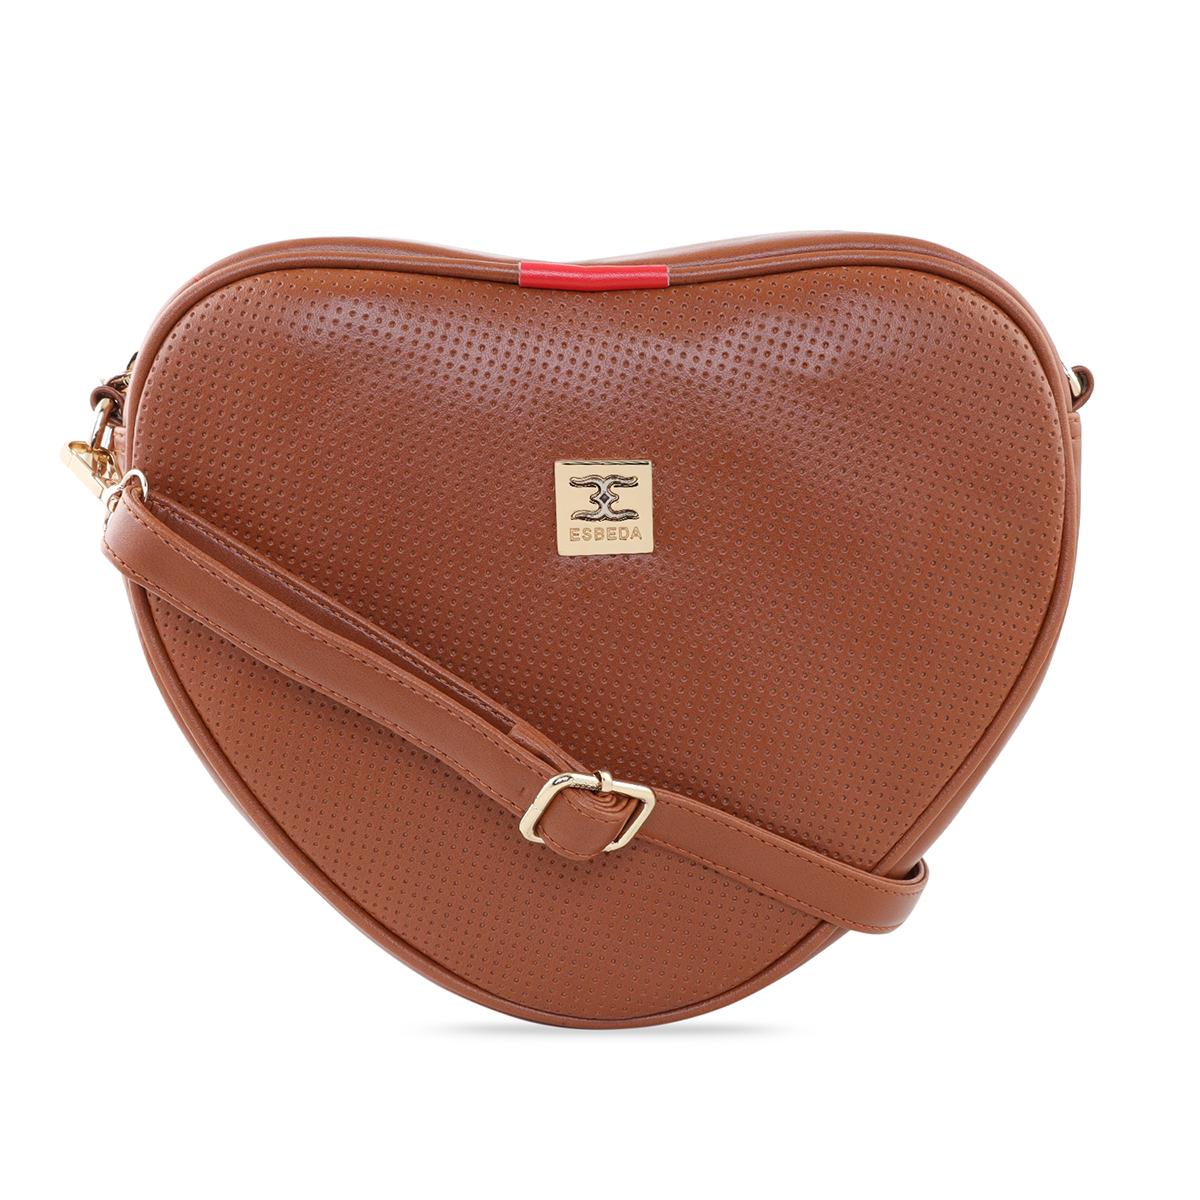 ESBEDA | ESBEDA Tan Color Heart Shape Sling Bag For Women